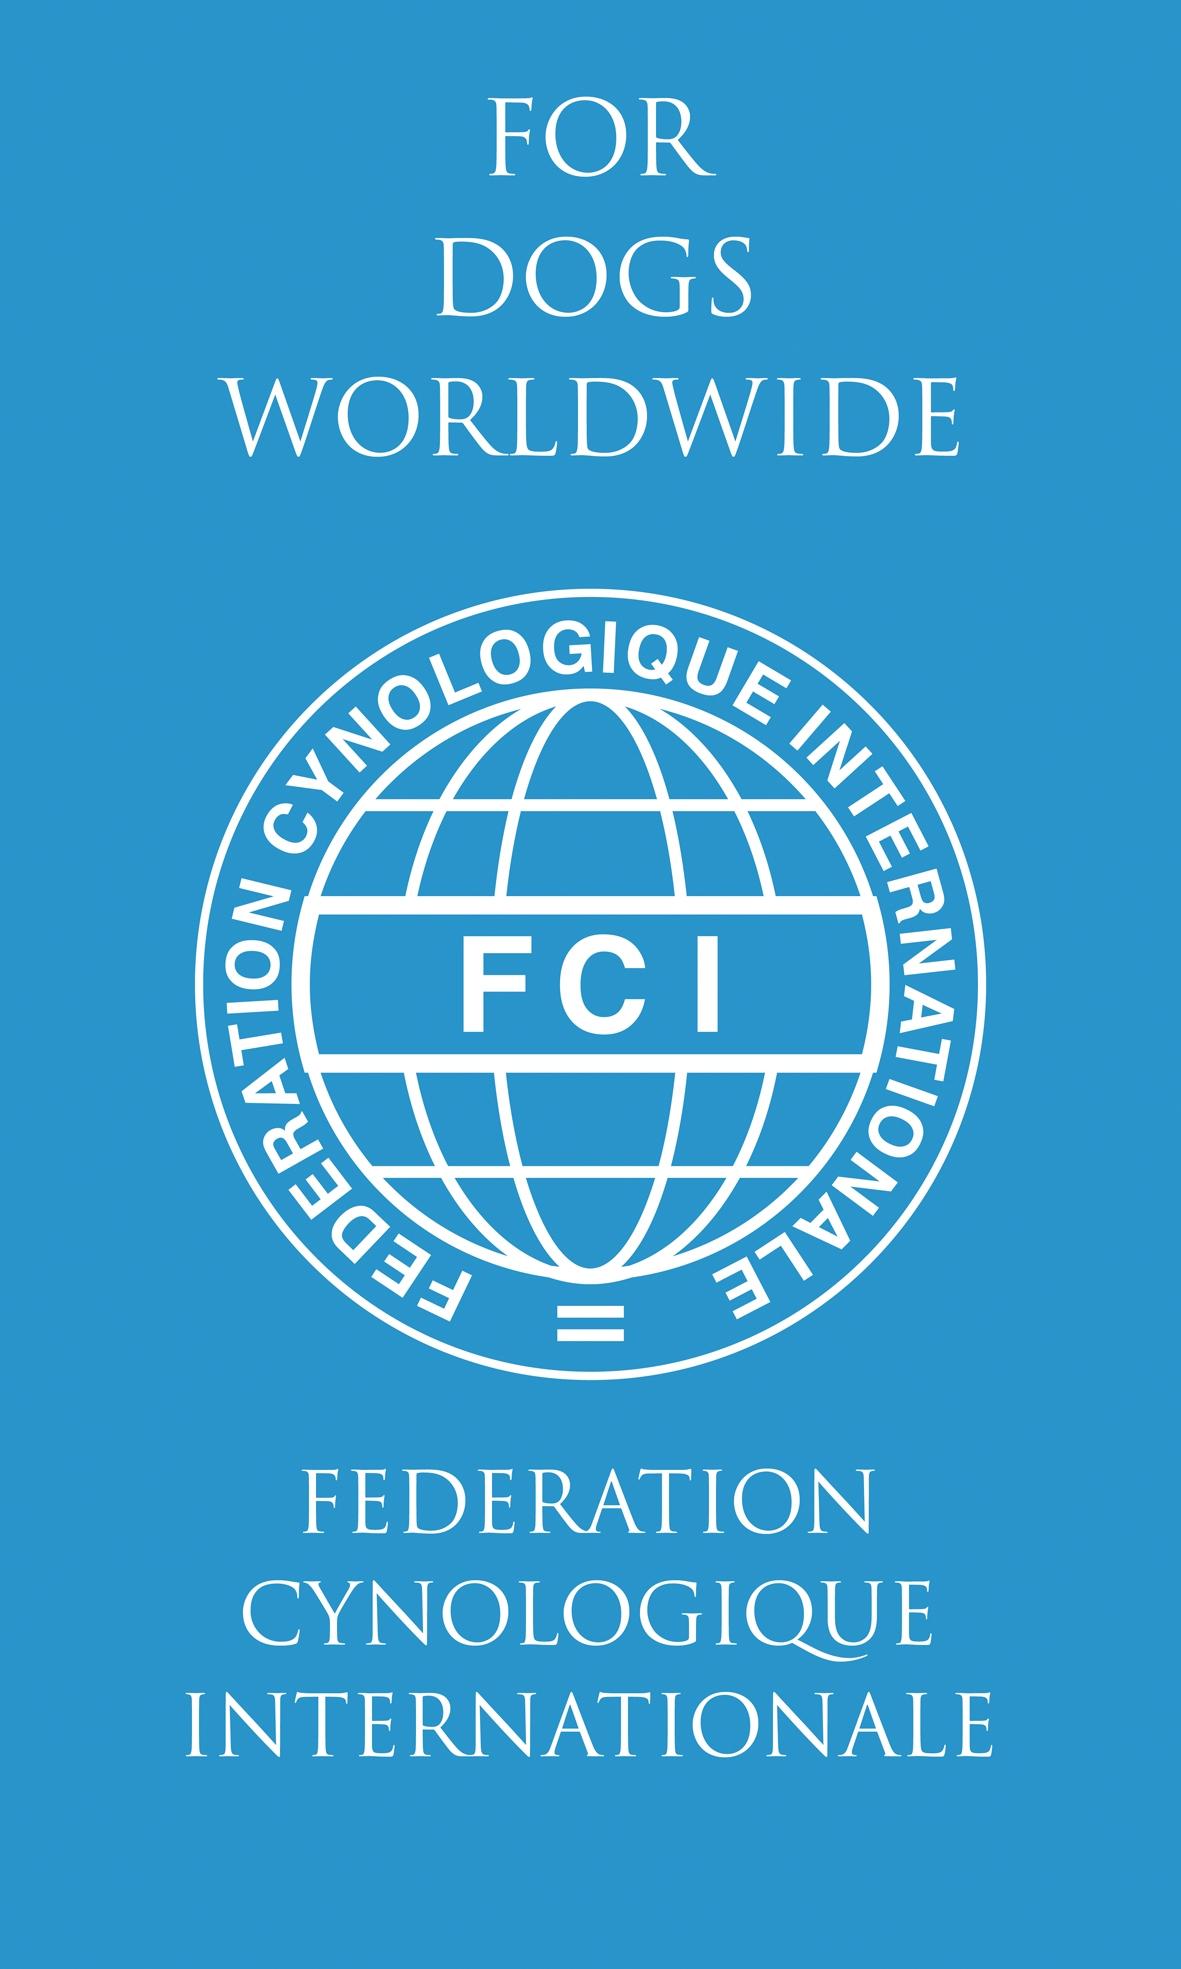 fci-mezinarodni-kynologicka-psi-organizace-01